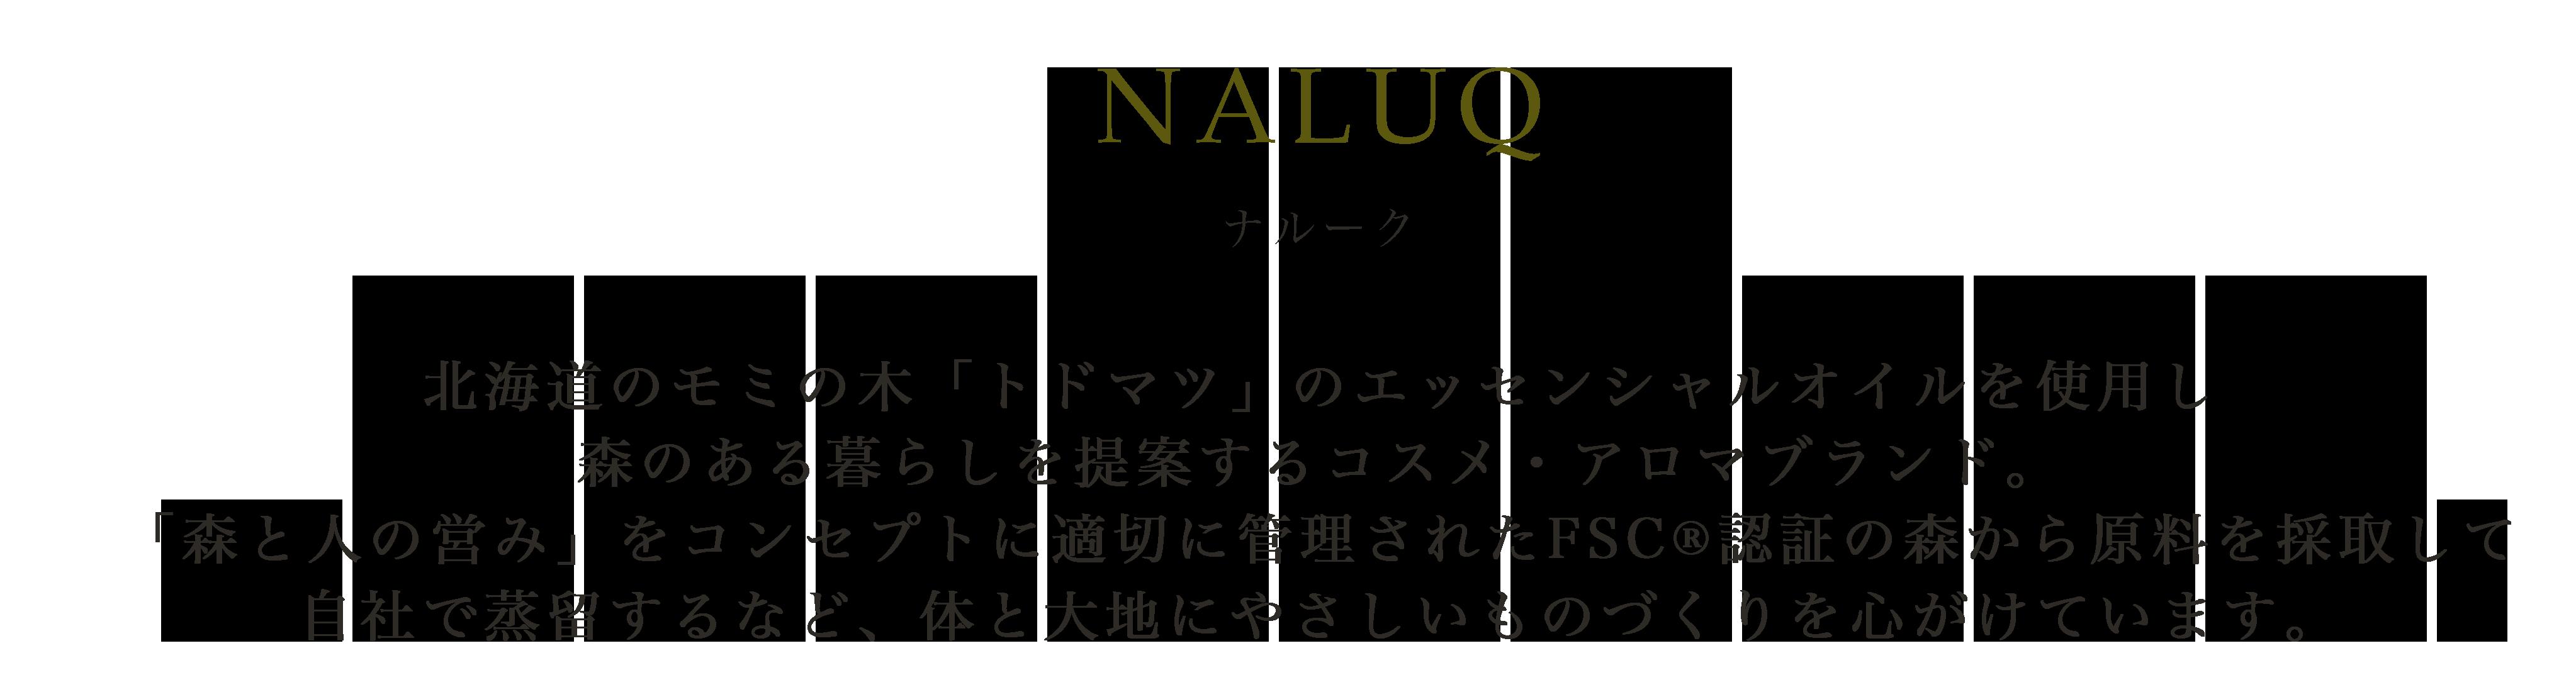 NALUQ